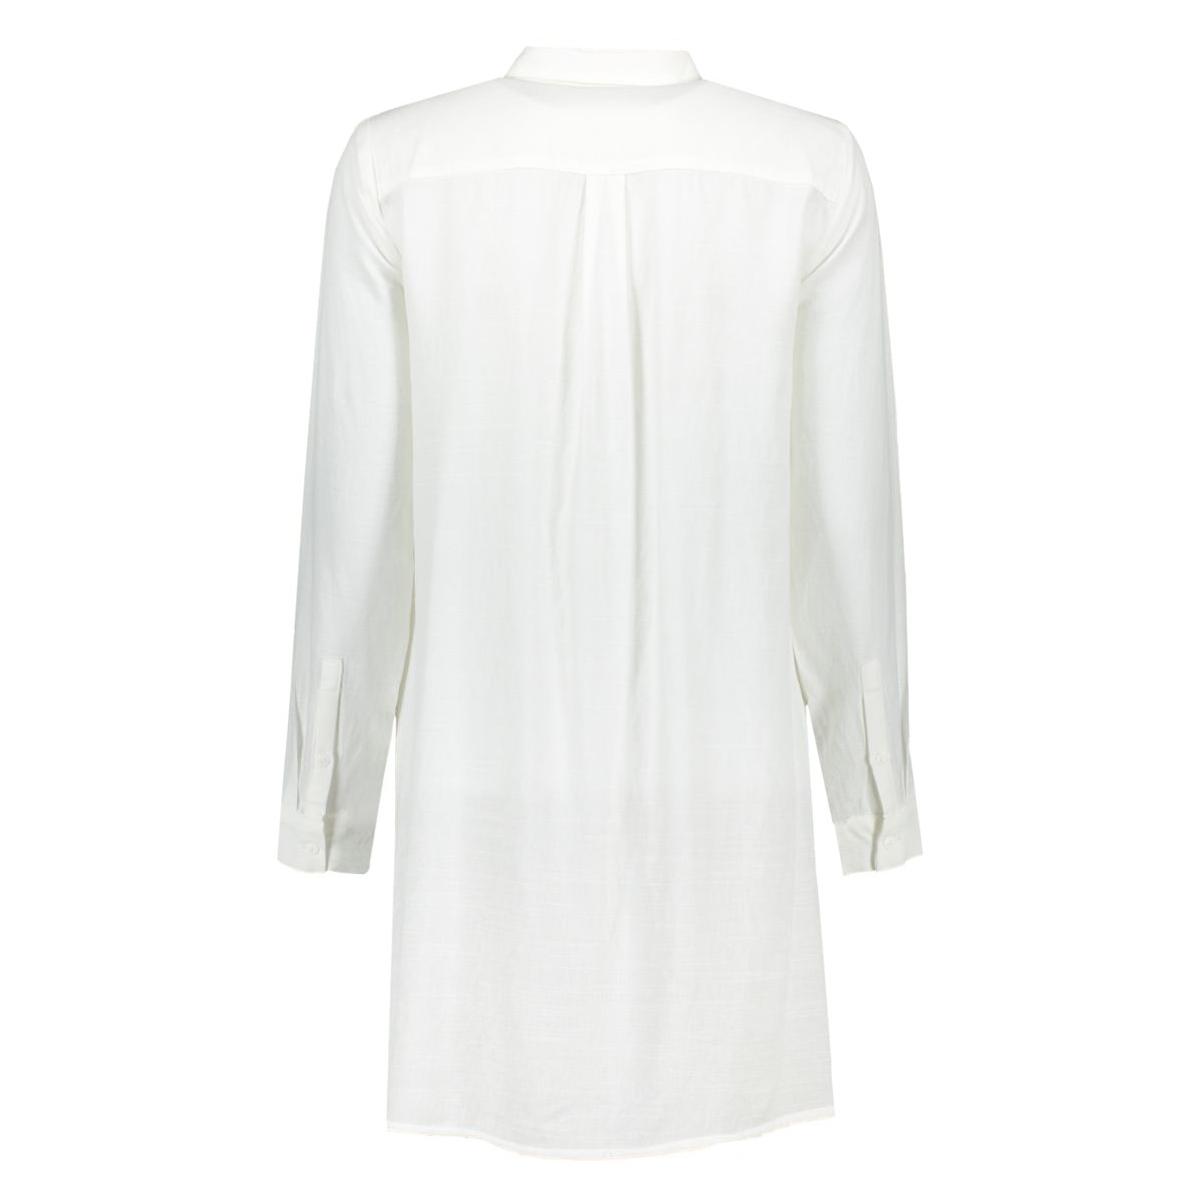 objcorine l/s long shirt noos 23023732 object blouse white